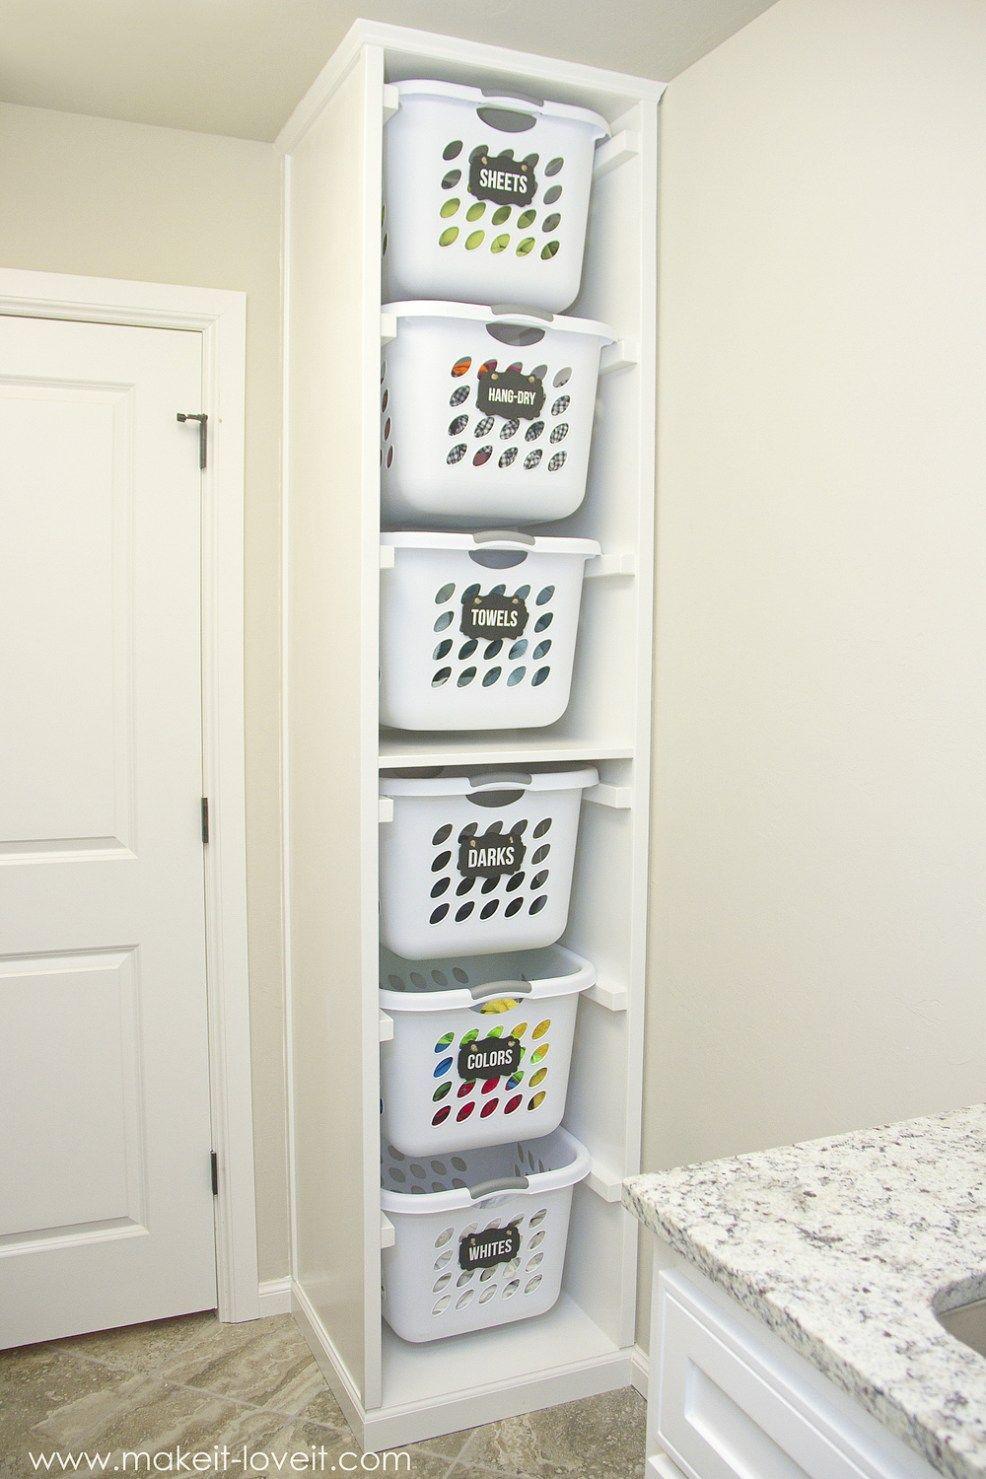 9 Diy Laundry Room Organization Ideas Every Tidy Person Should